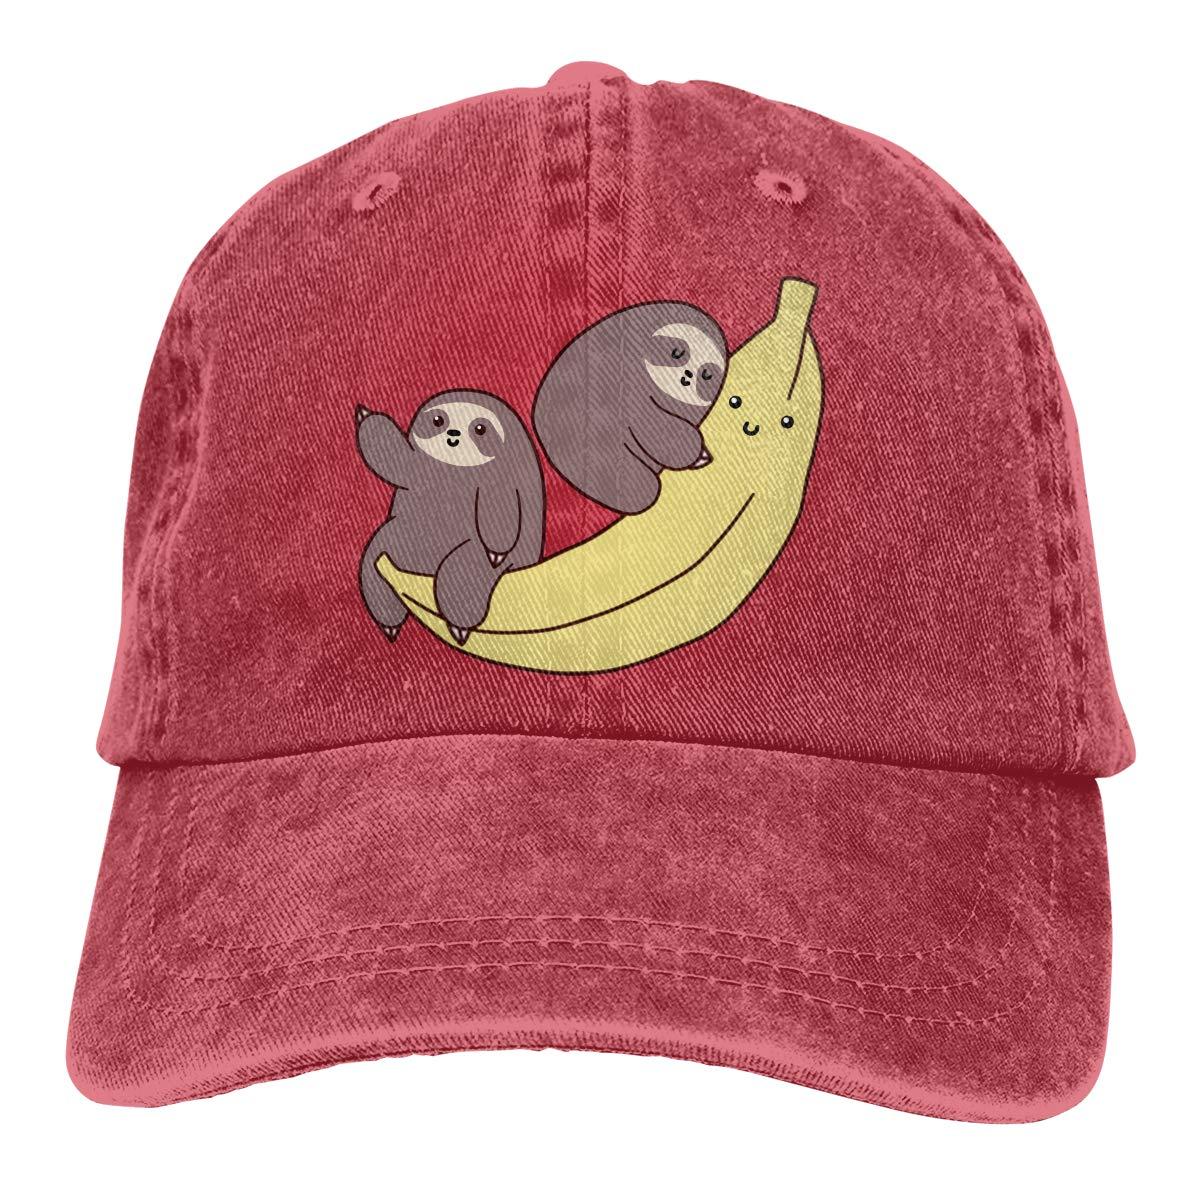 Sloth and Turtles Denim Baseball Caps Hat Adjustable Cotton Sport Strap Cap for Men Women JTRVW Cowboy Hats